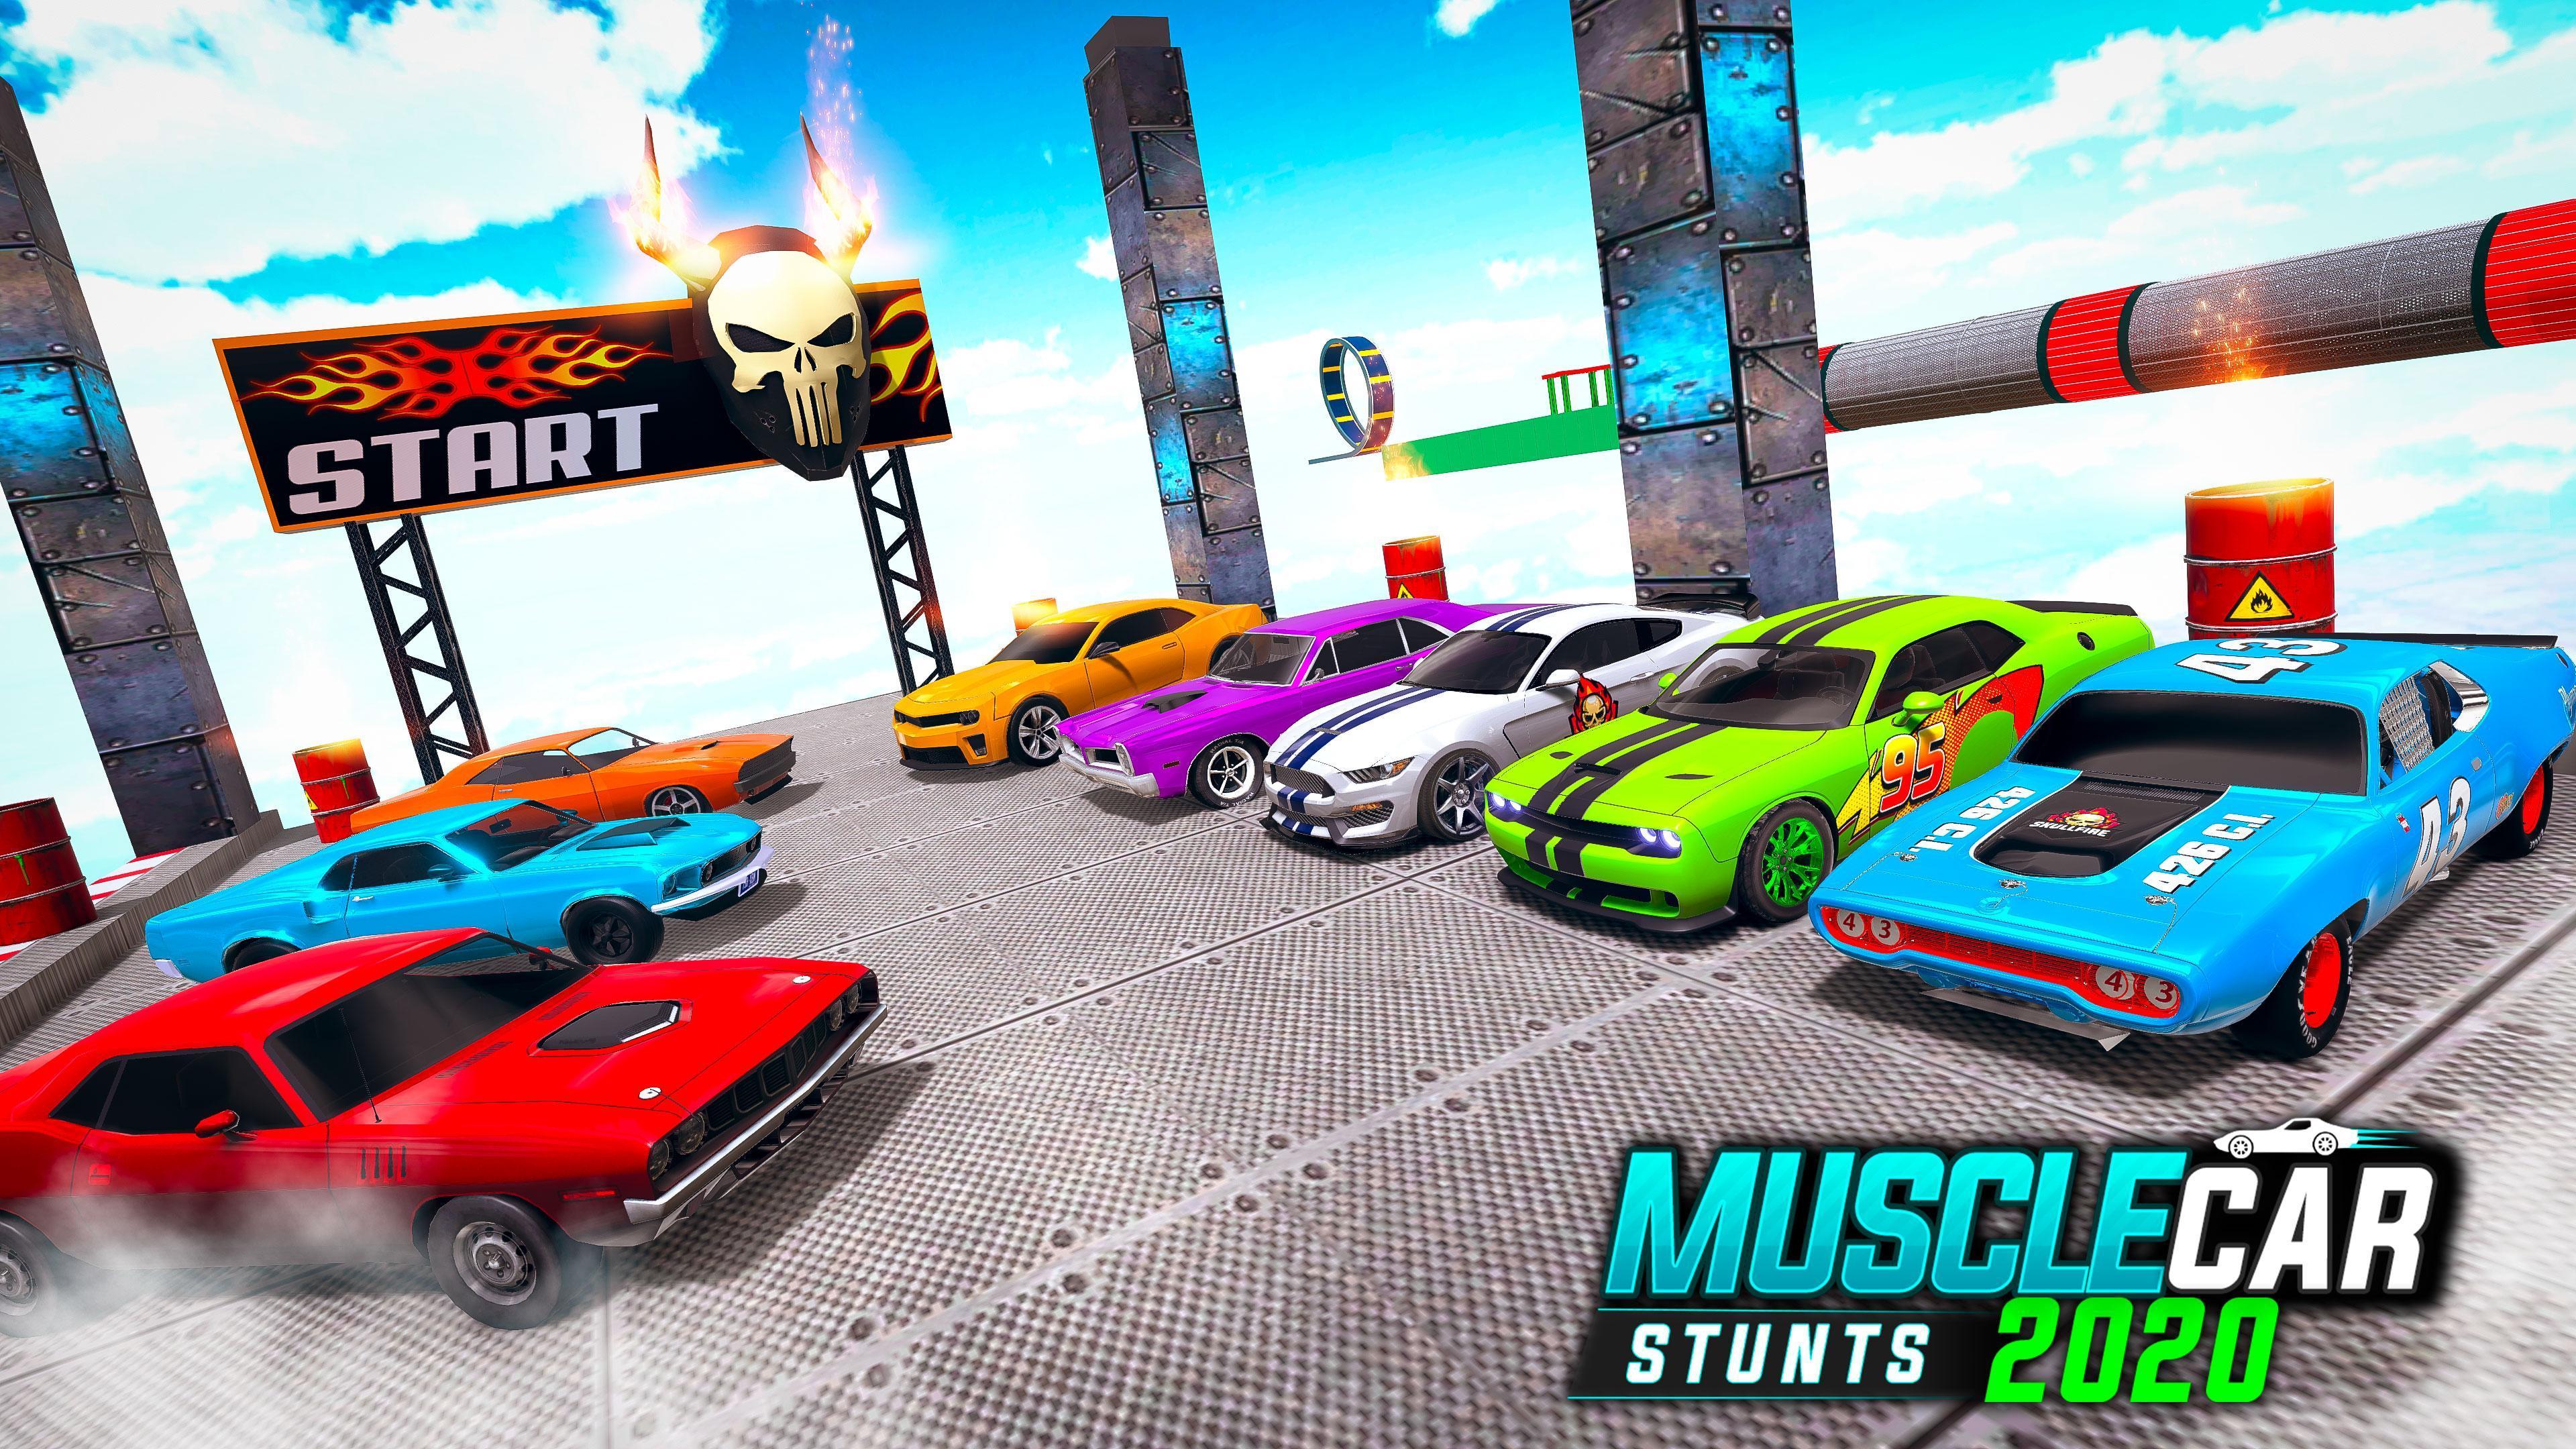 Muscle Car Stunts 2020 Mega Ramp Stunt Car Games 1.0.9 Screenshot 20